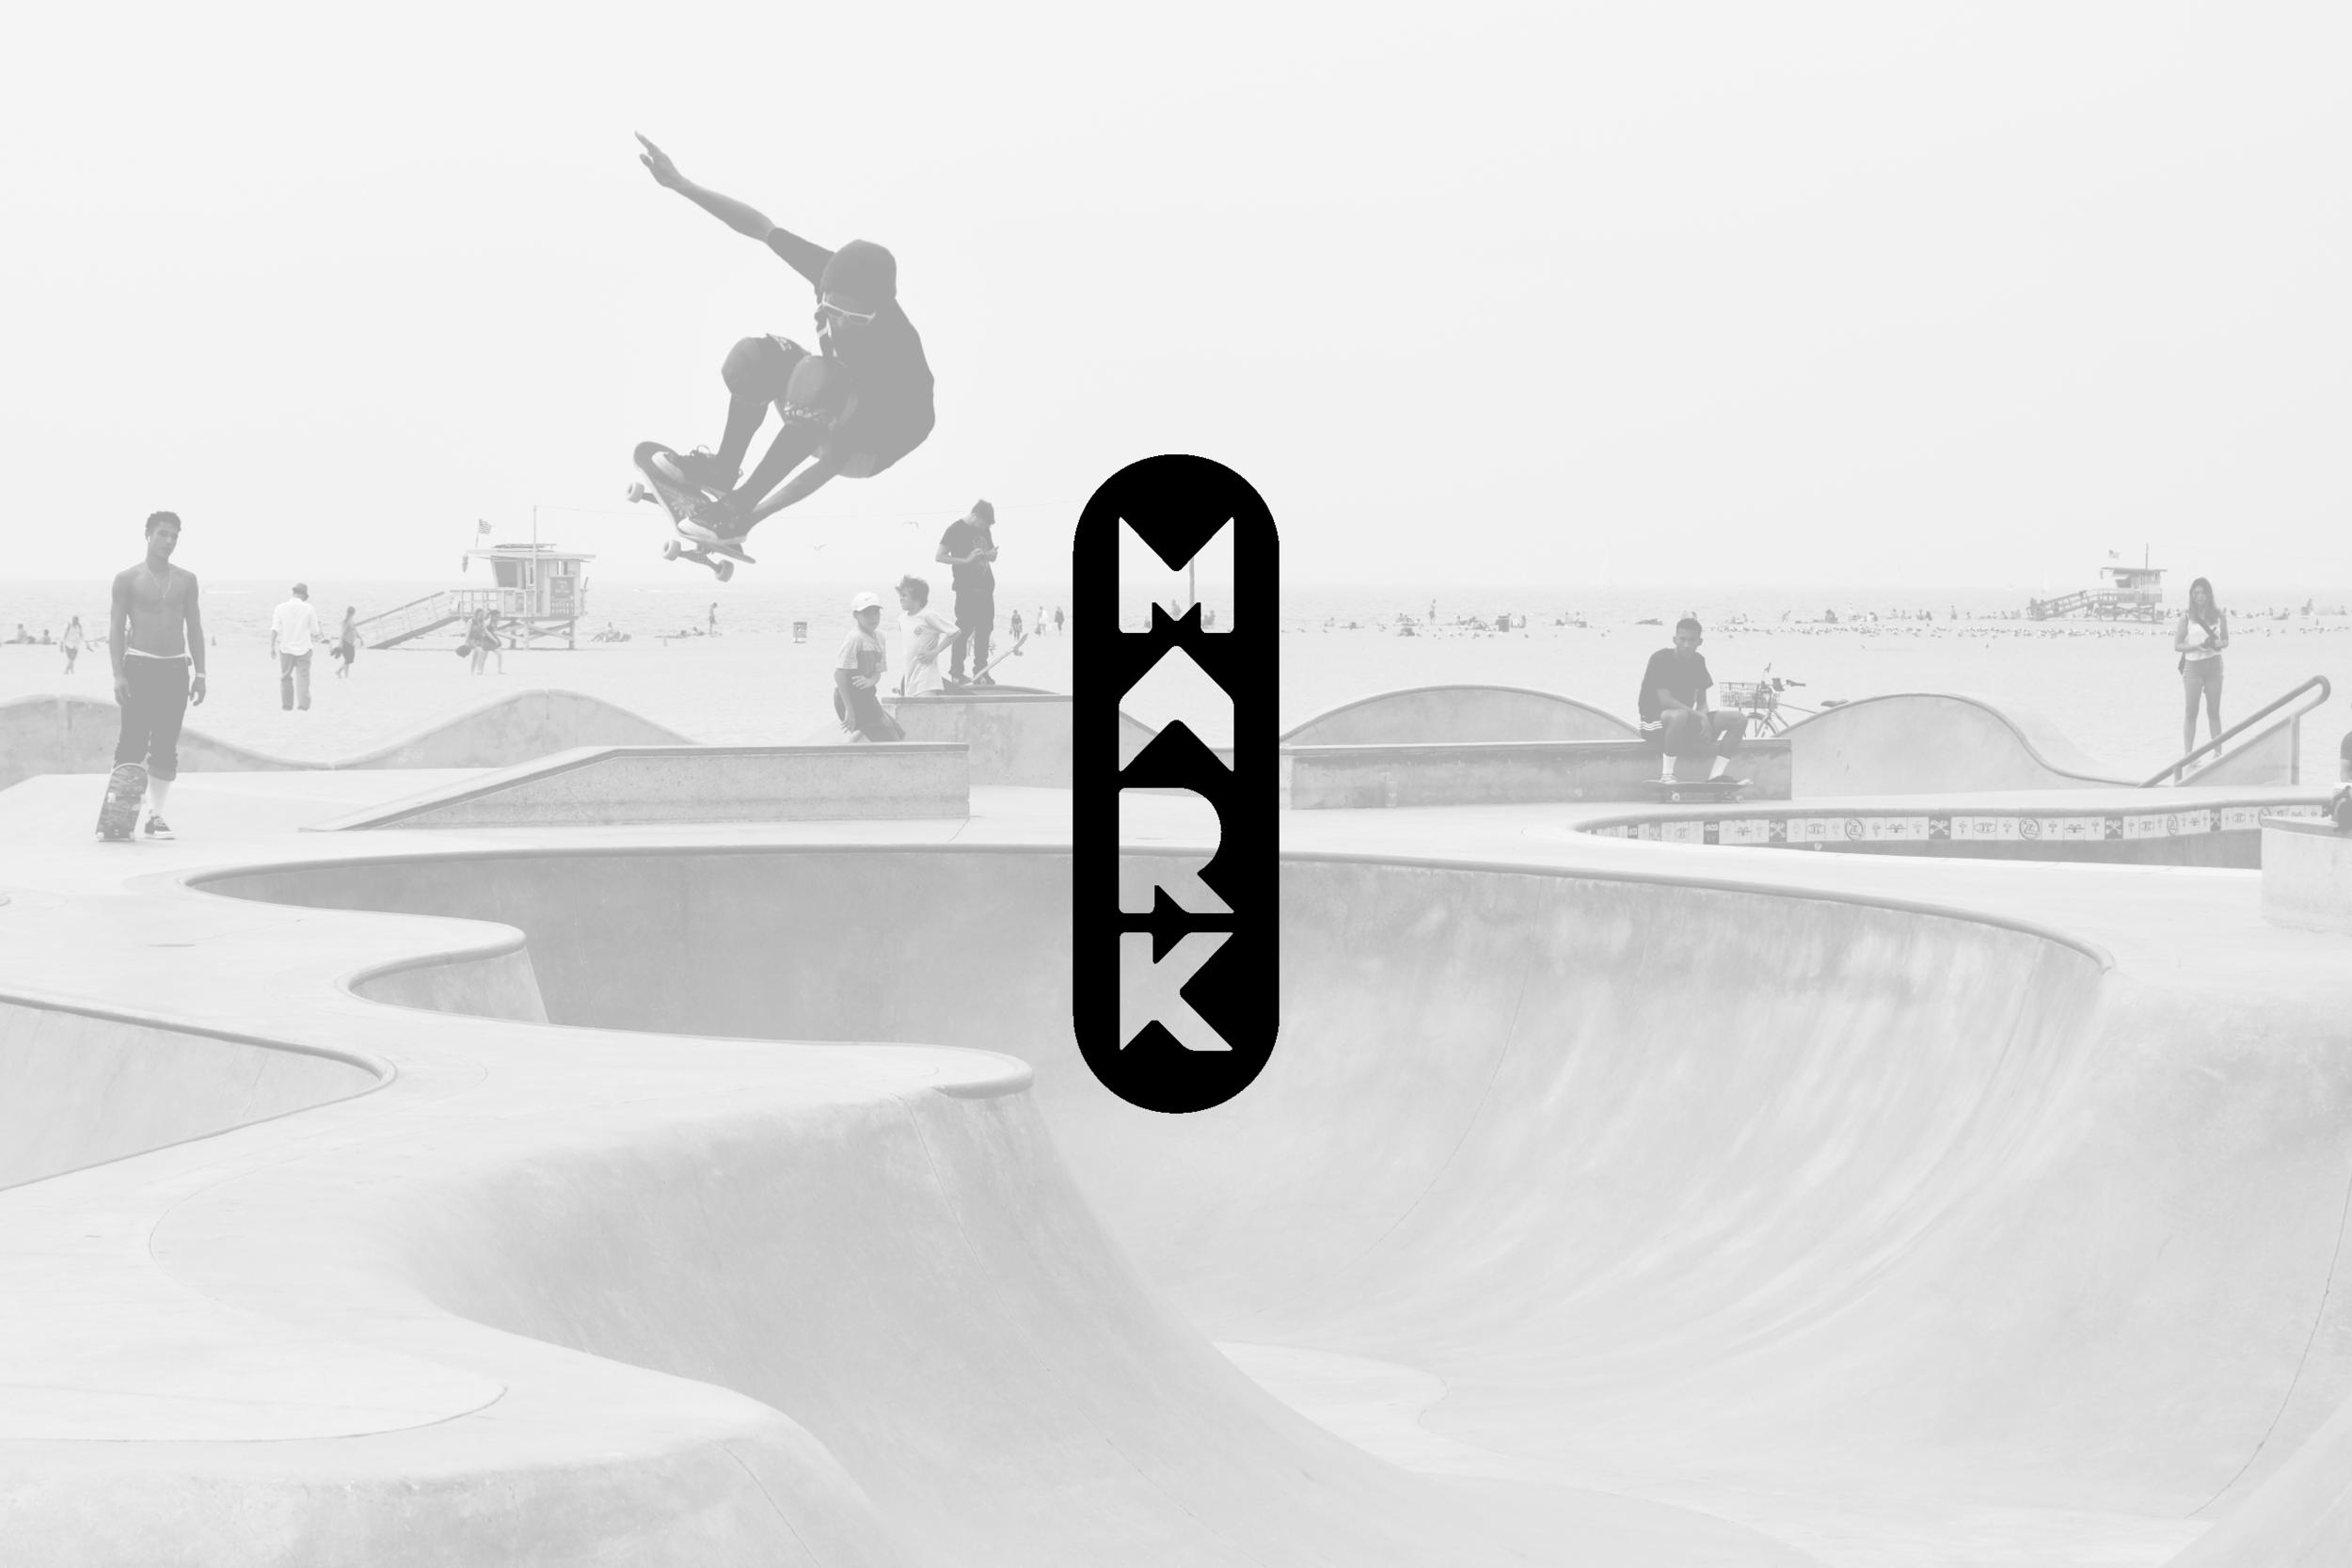 Logo design for MARK Skateboards, skateboard company in Austin, Texas.